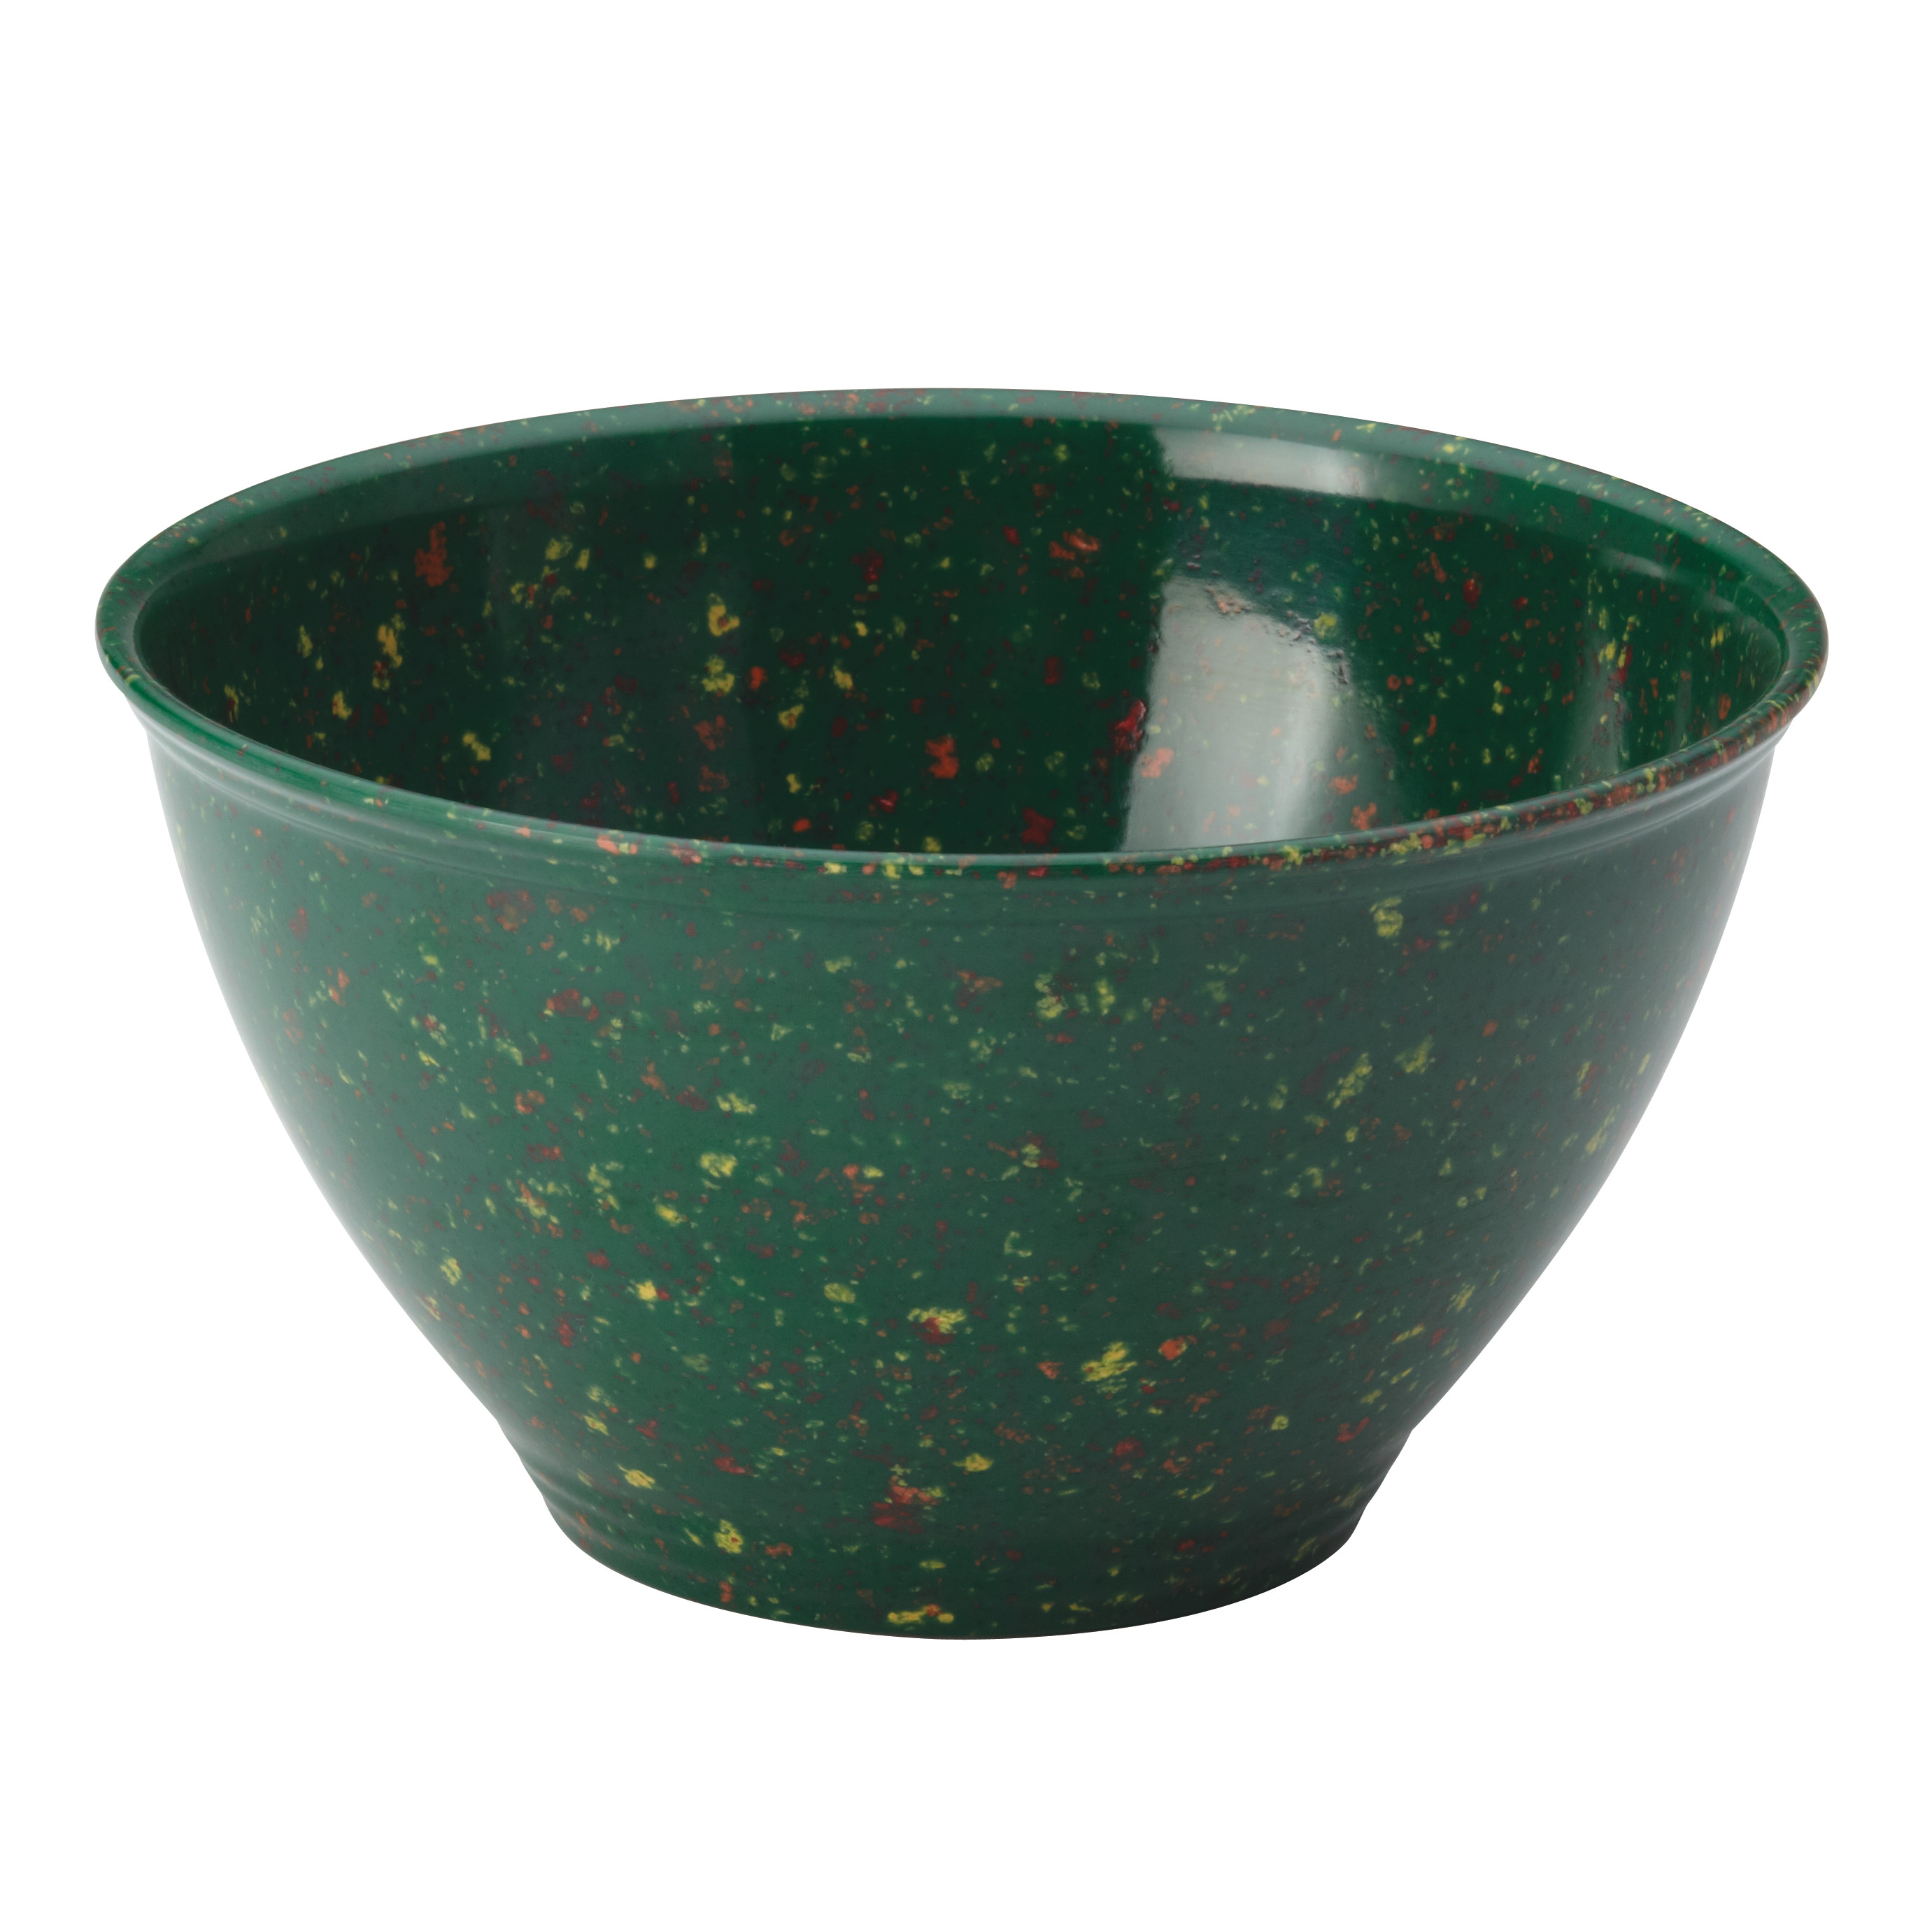 Rachael Ray Accessories Garbage Bowl Dark Green